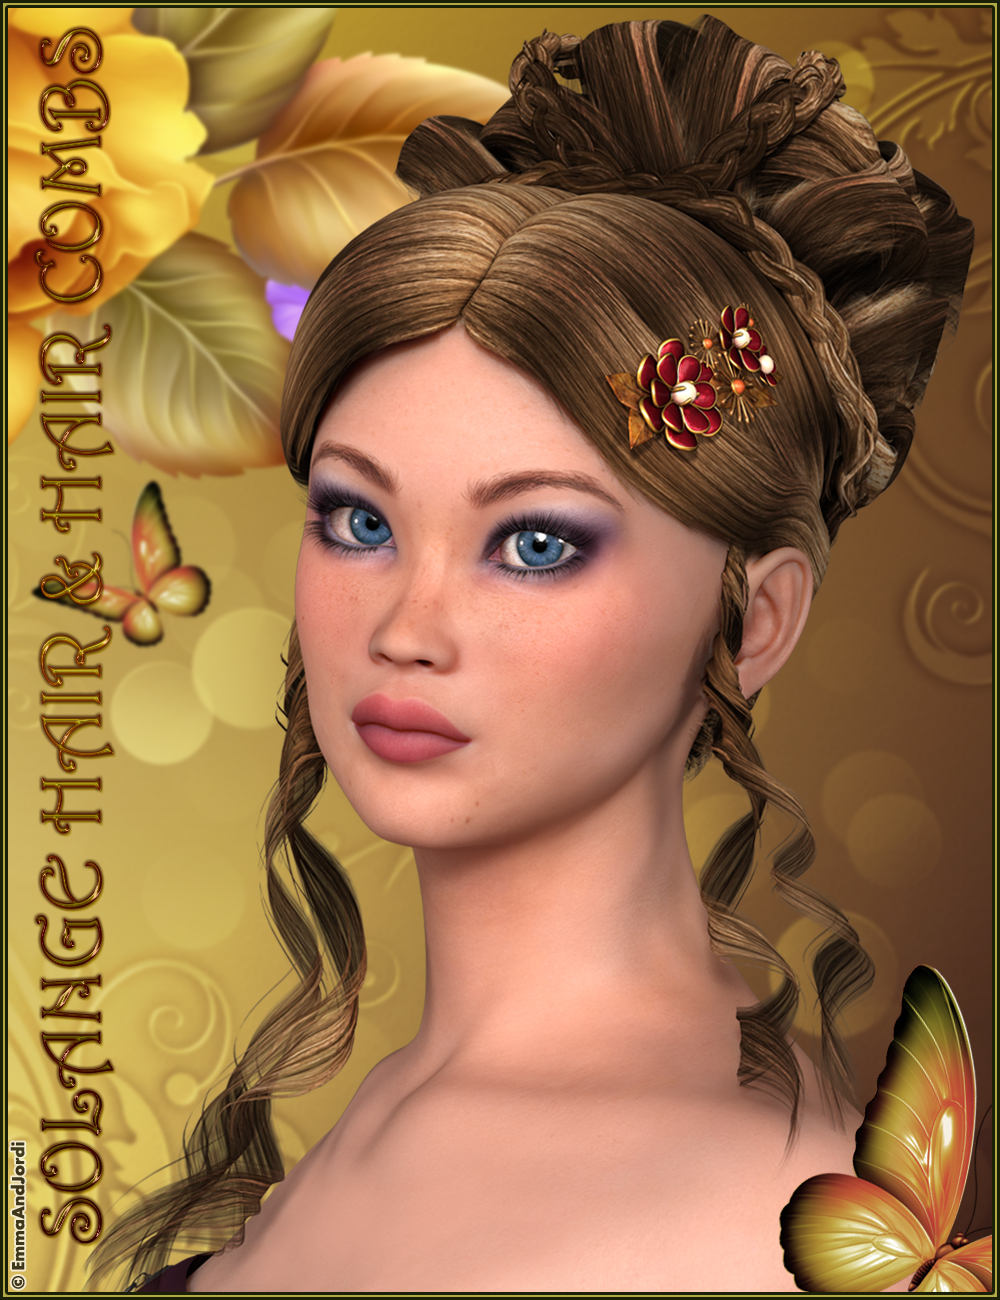 Solange Hair and Hair Combs by: EmmaAndJordi, 3D Models by Daz 3D